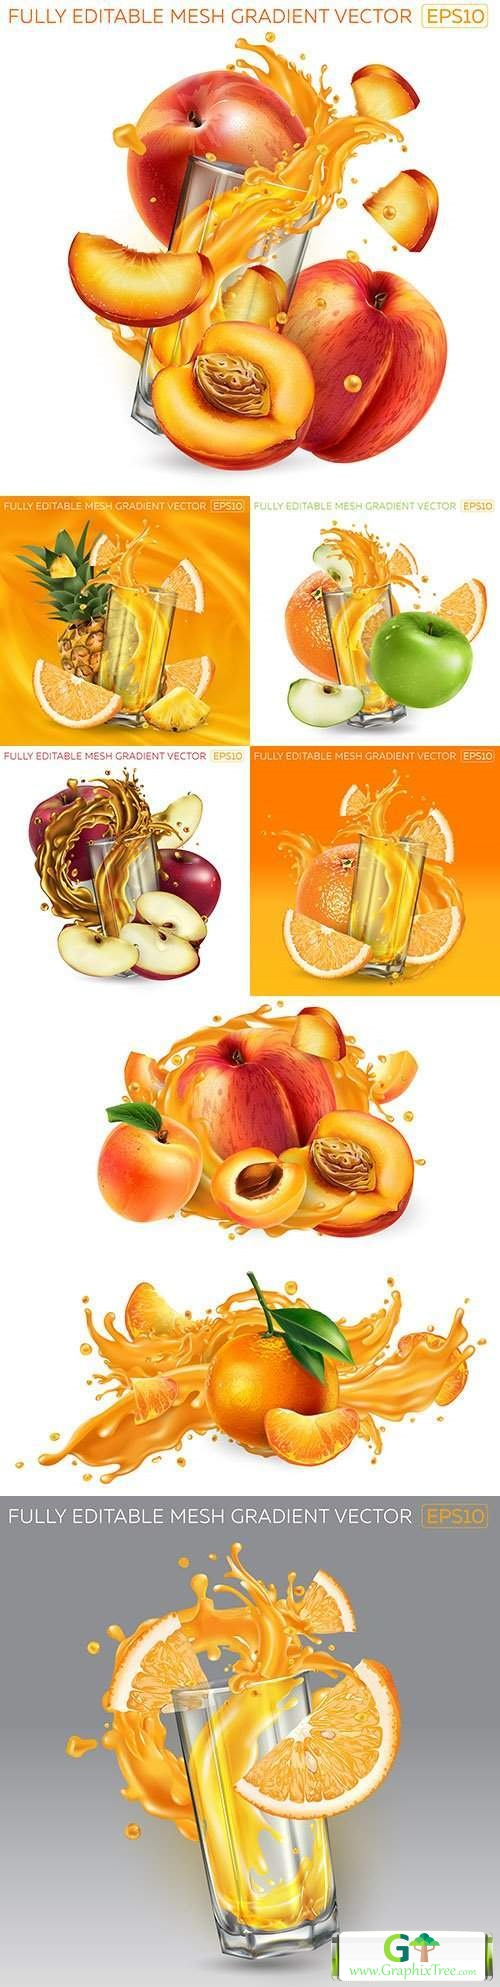 Whole fruit and bulls fruit juice realistic illustrations